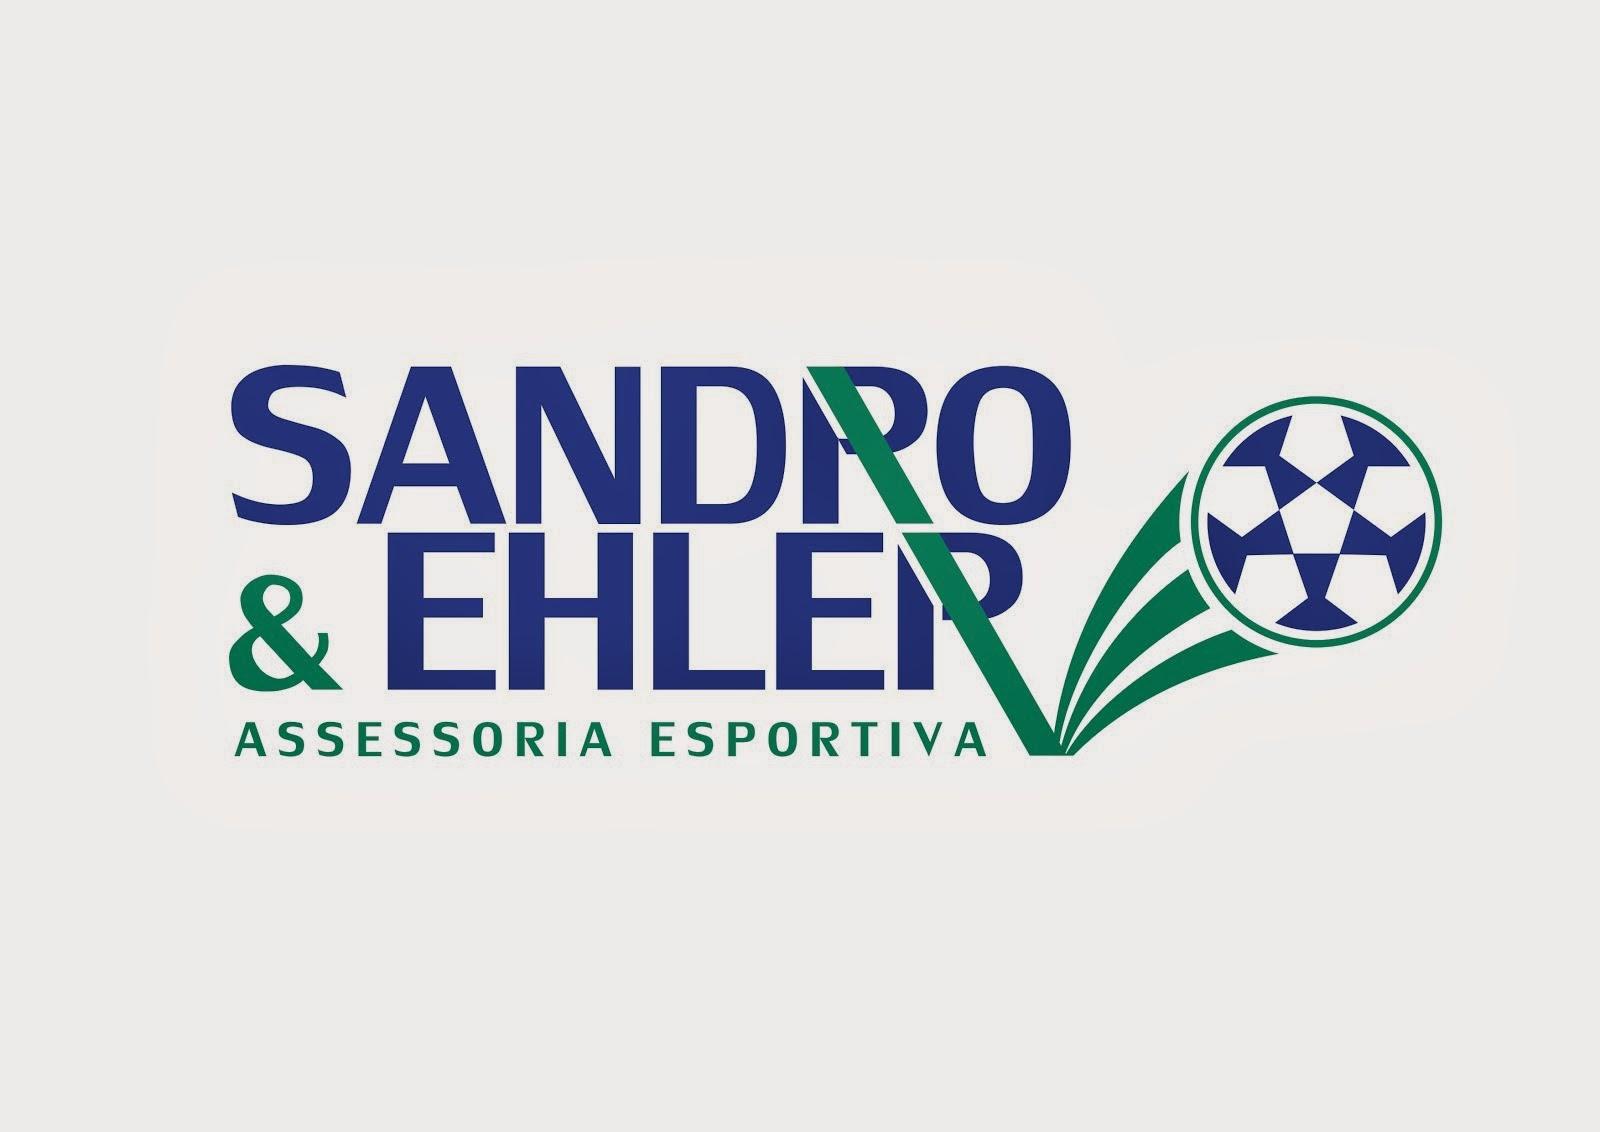 Assessoria Esportiva Sandro e Ehler